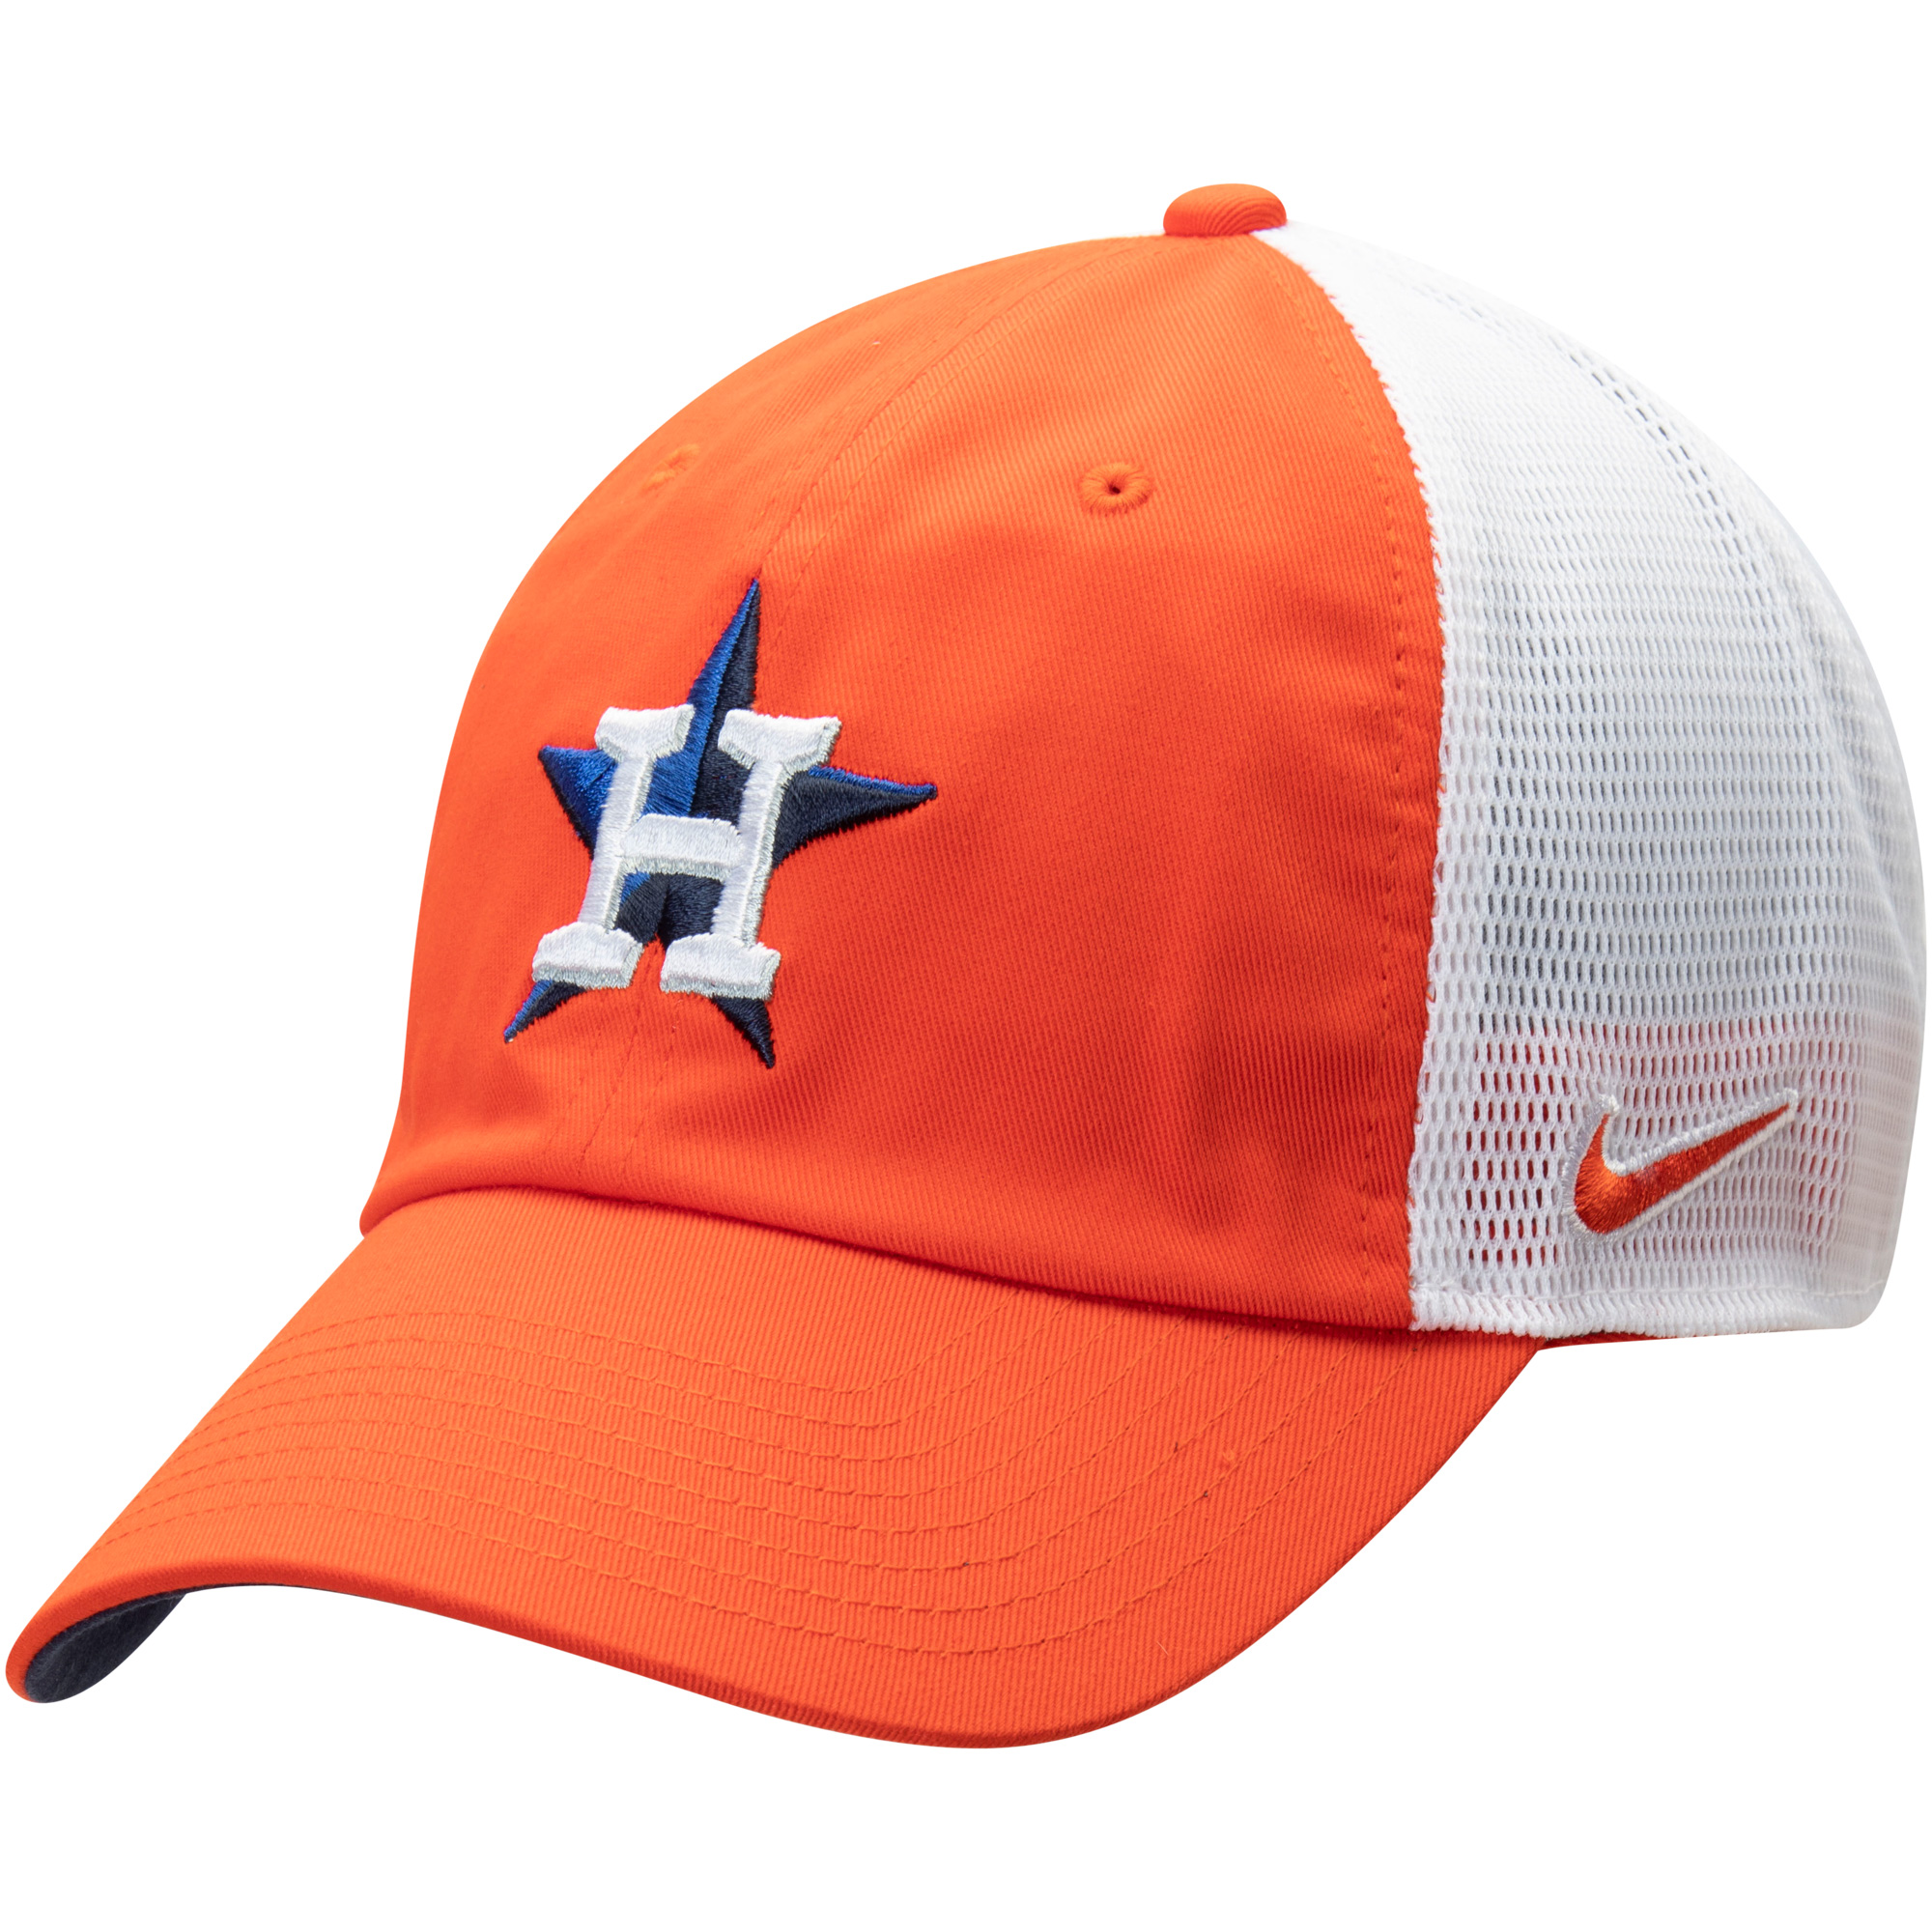 Houston Astros Nike Heritage 86 Team Trucker Adjustable Hat - Orange/White - OSFA